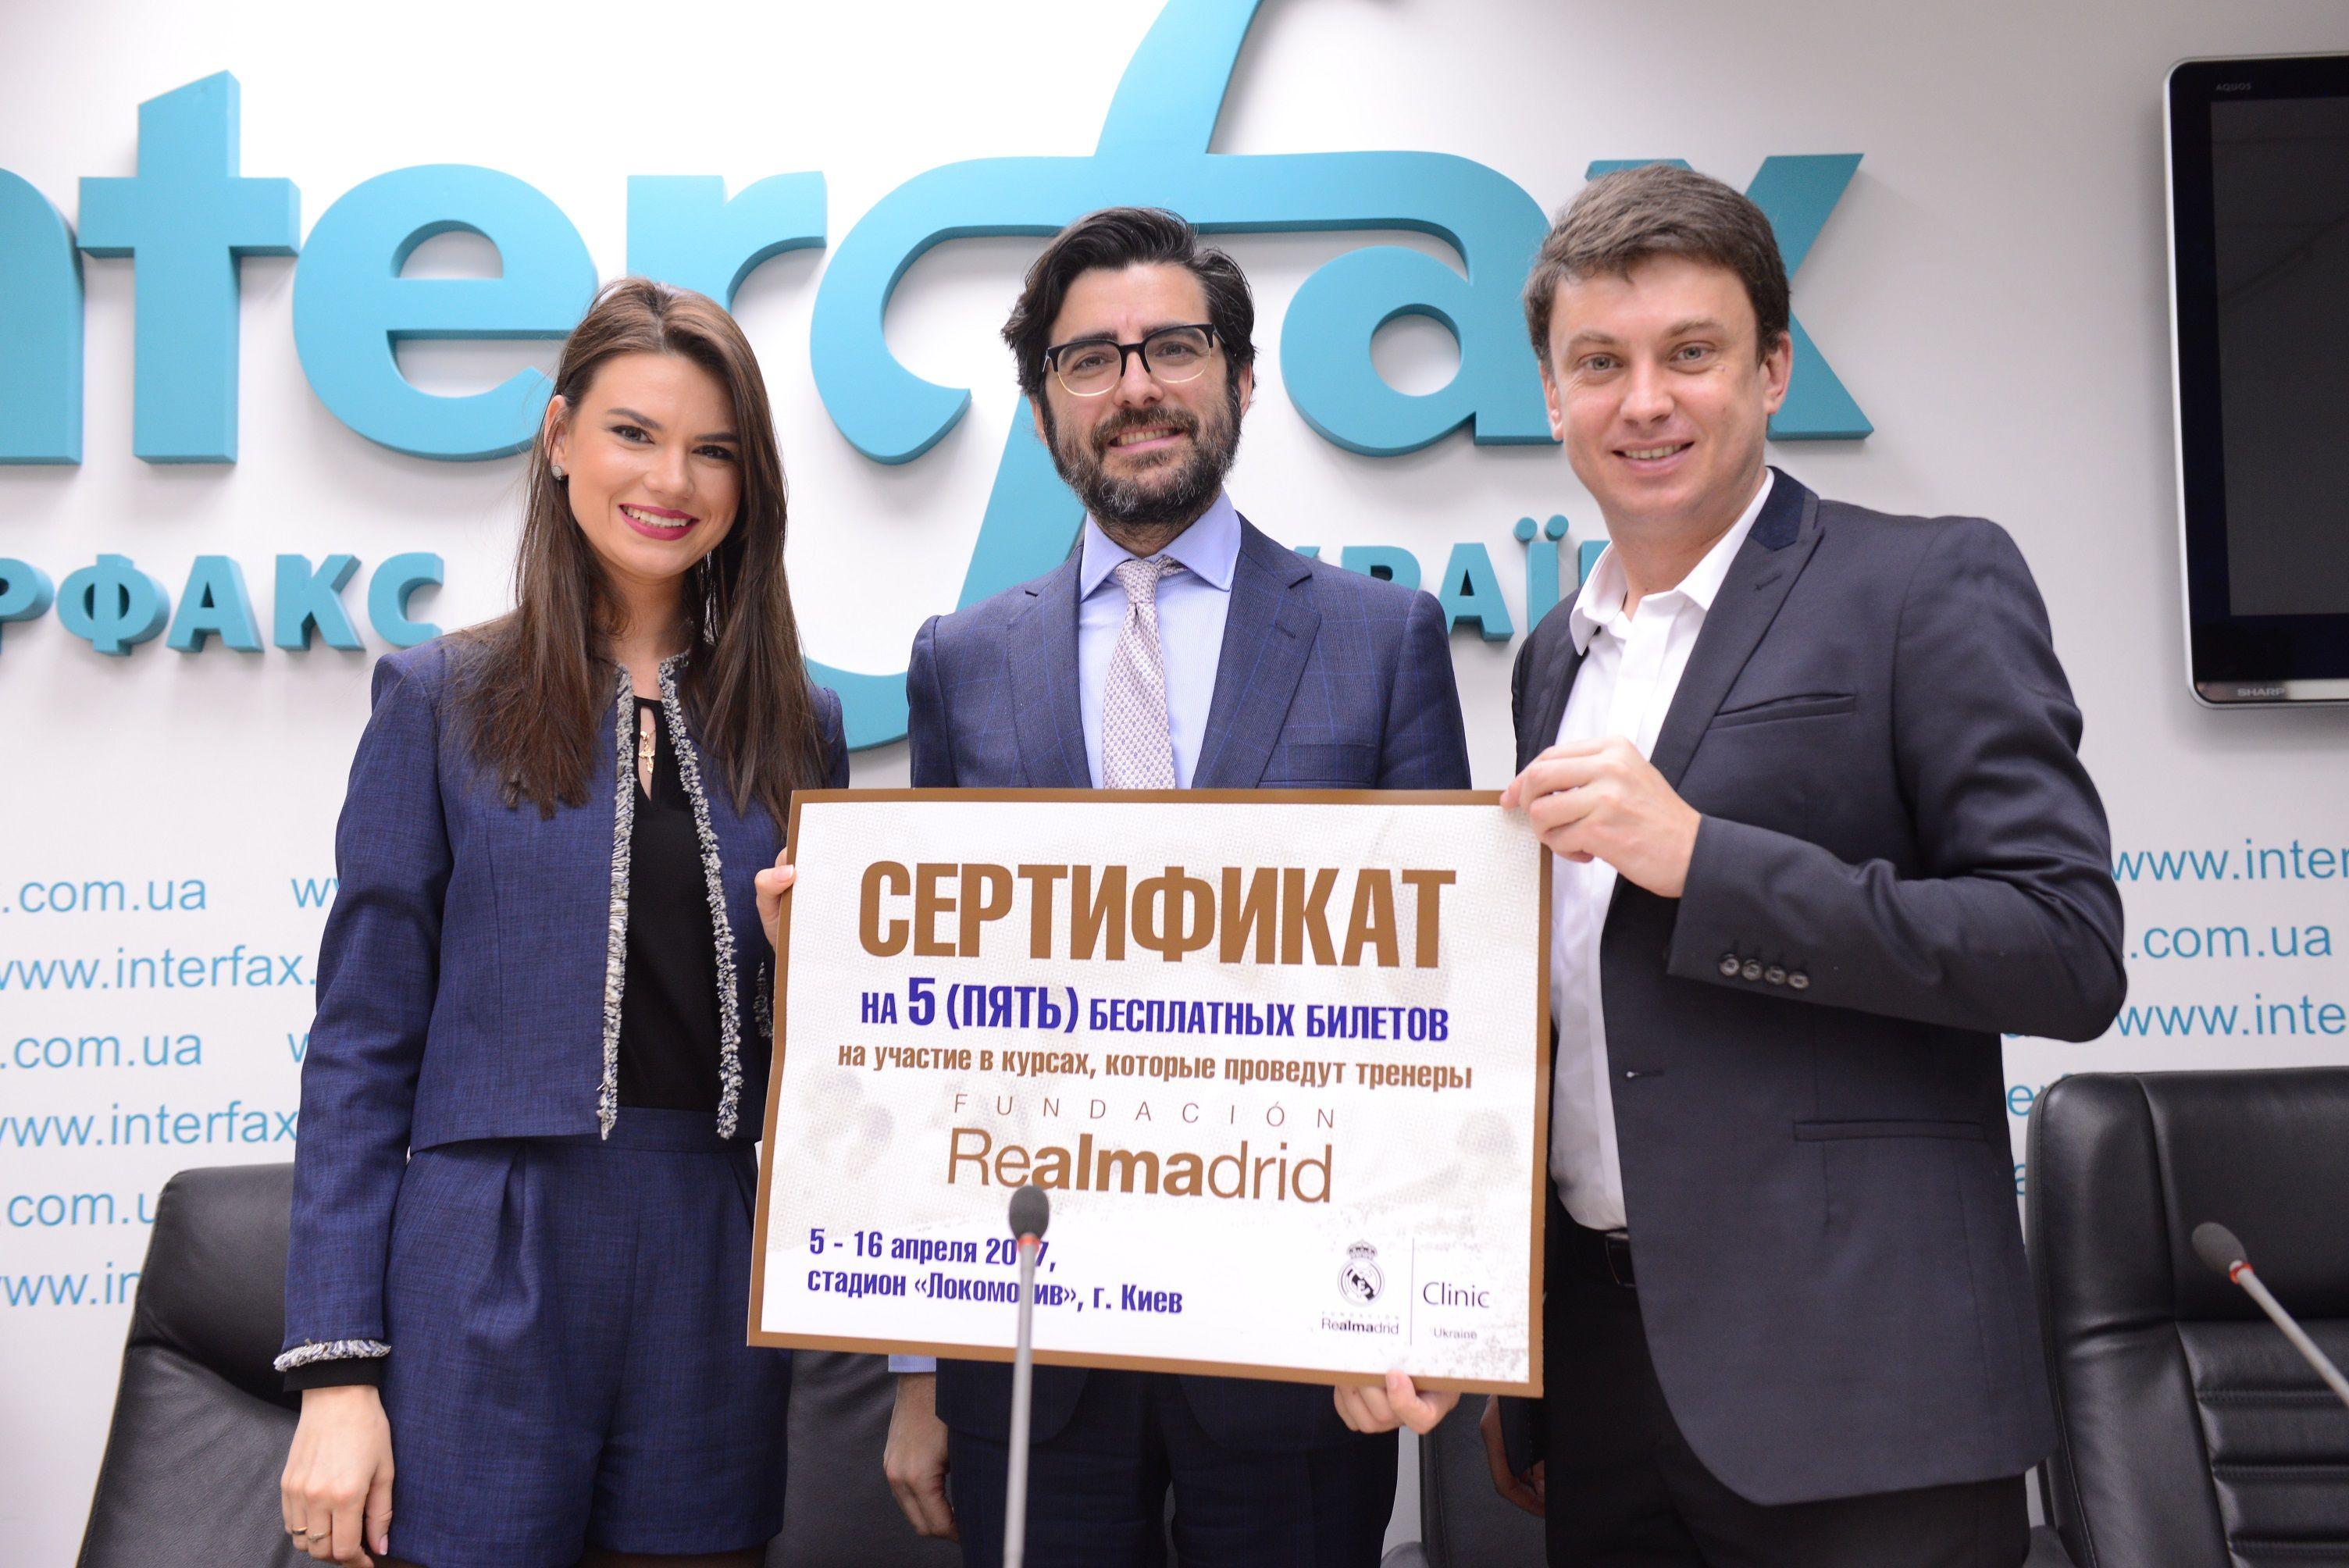 Олександра Лобода, Ігор Циганик та Андрес Мунтанер